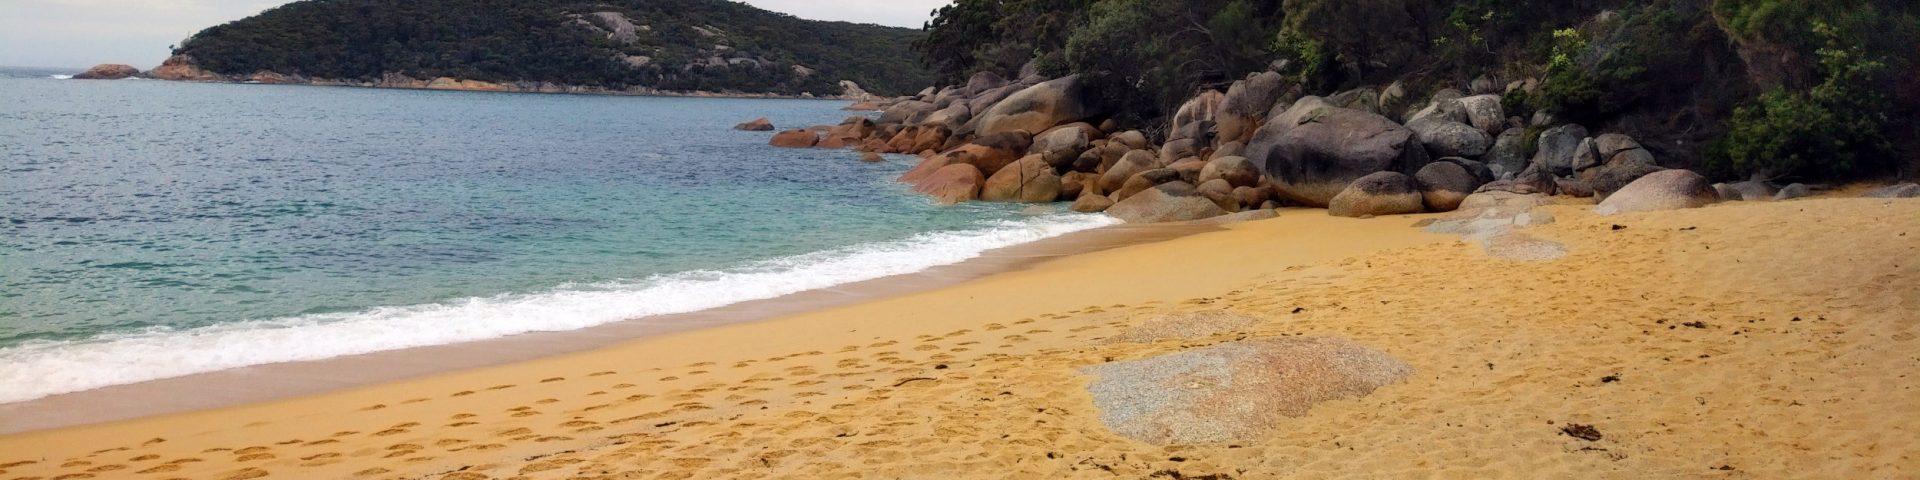 Refuge Cove Nth